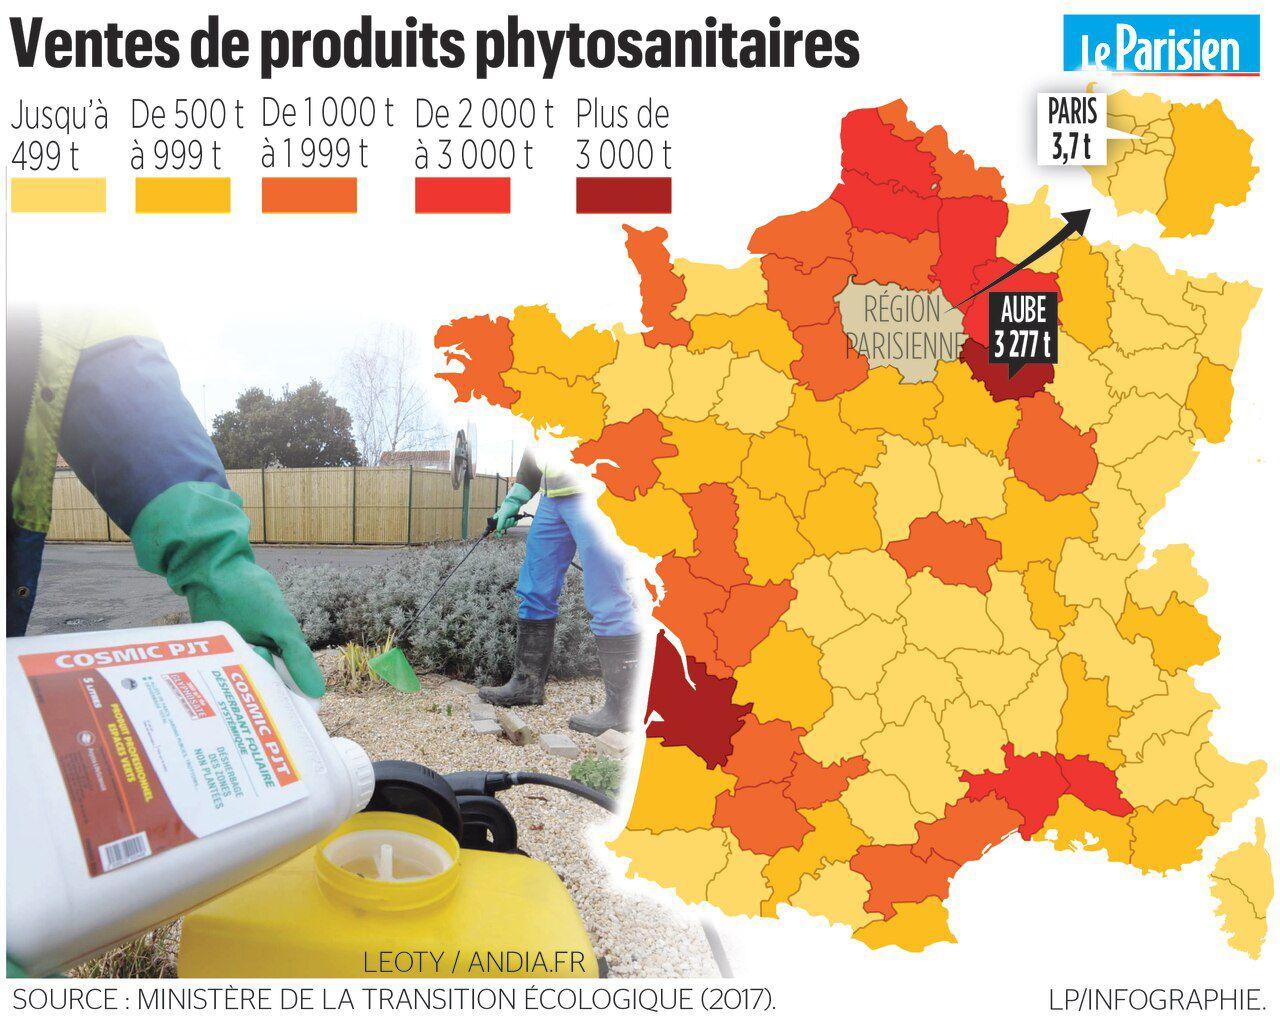 Ventes de produits phytosanitaries